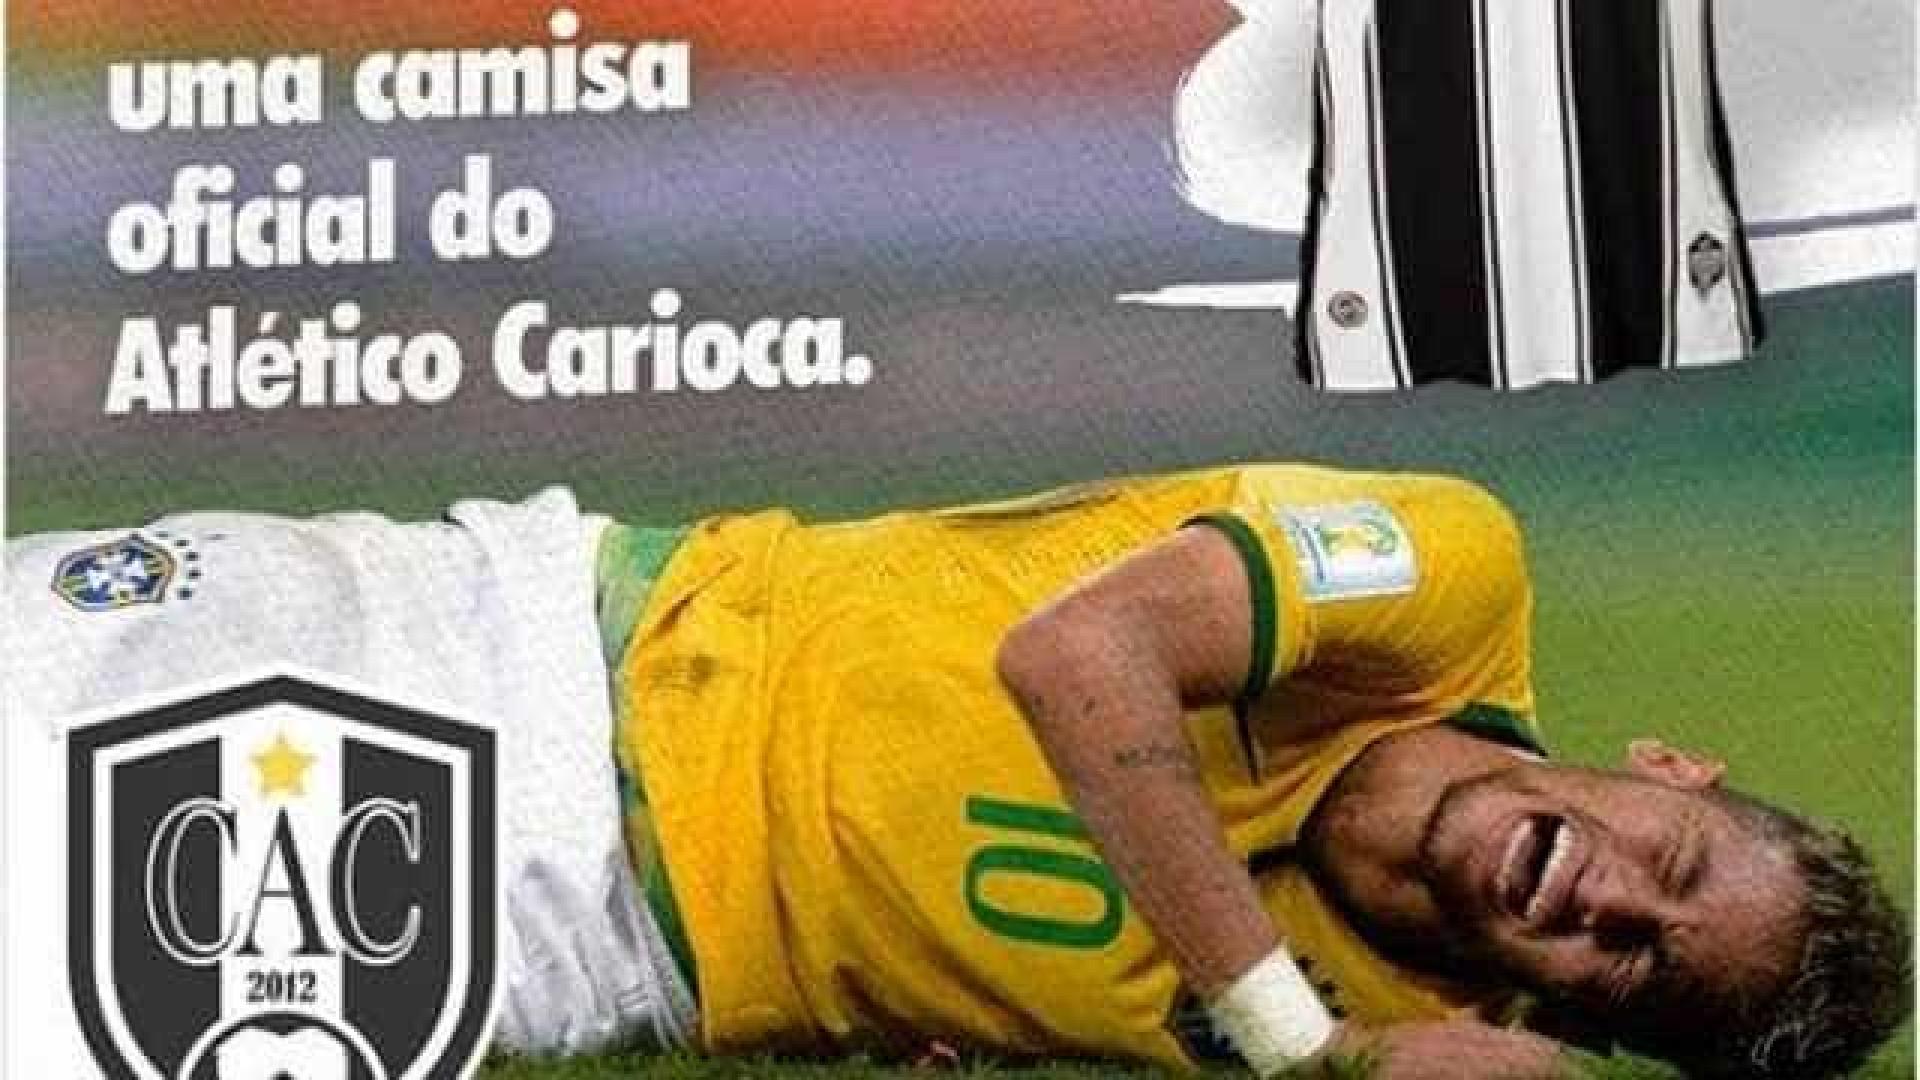 Time de Túlio Maravilha sorteará camisa para cada queda de Neymar